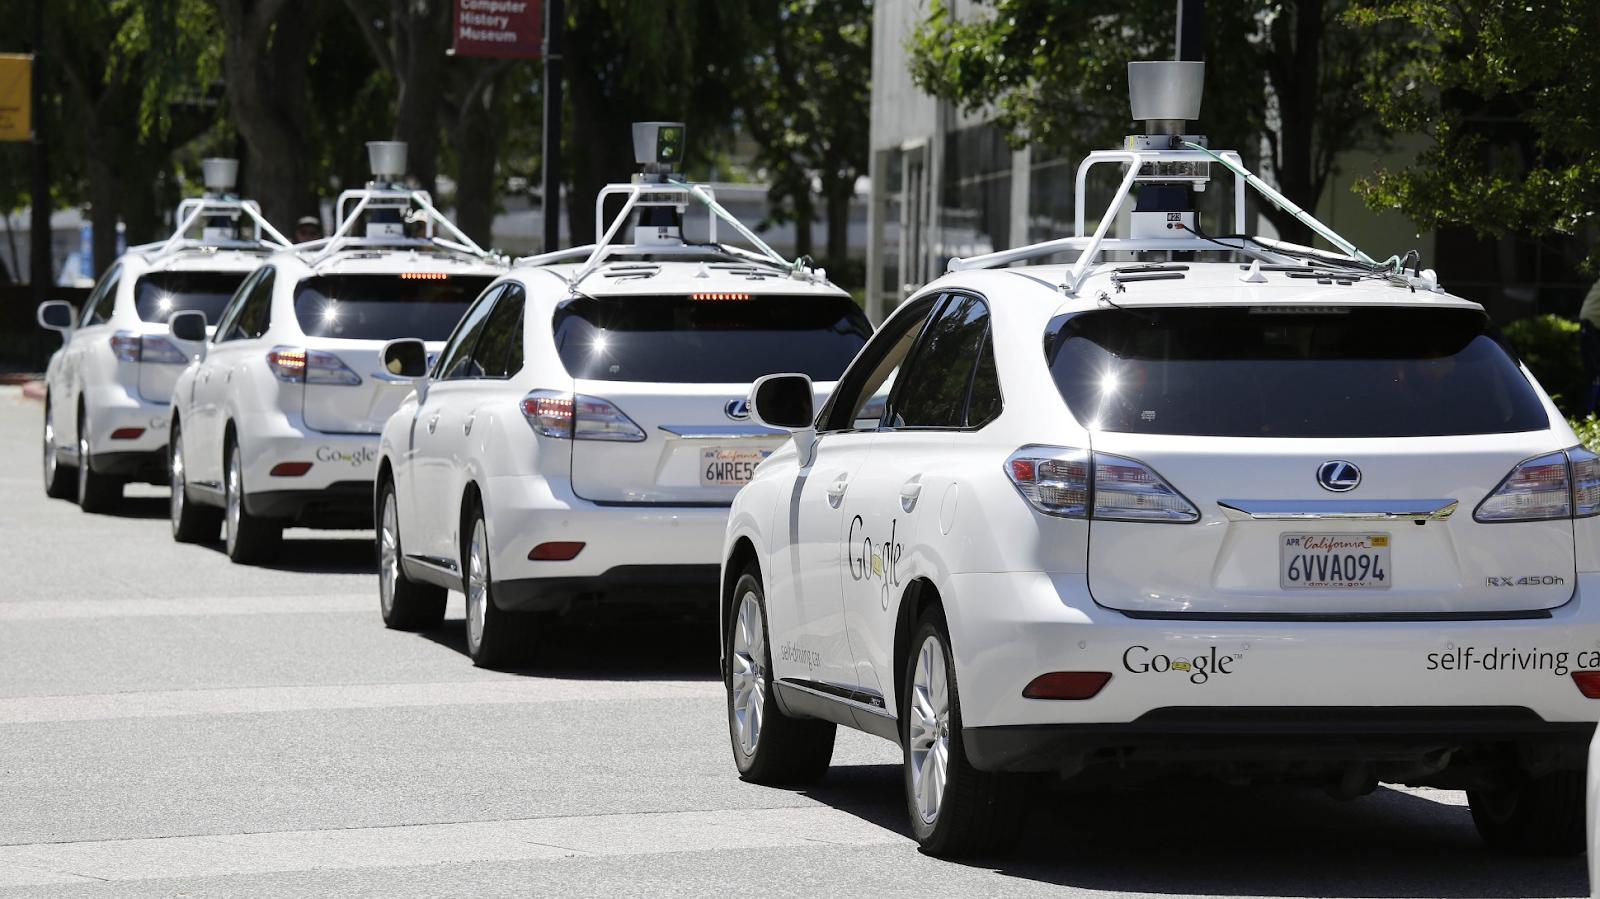 Google's self-driving cars